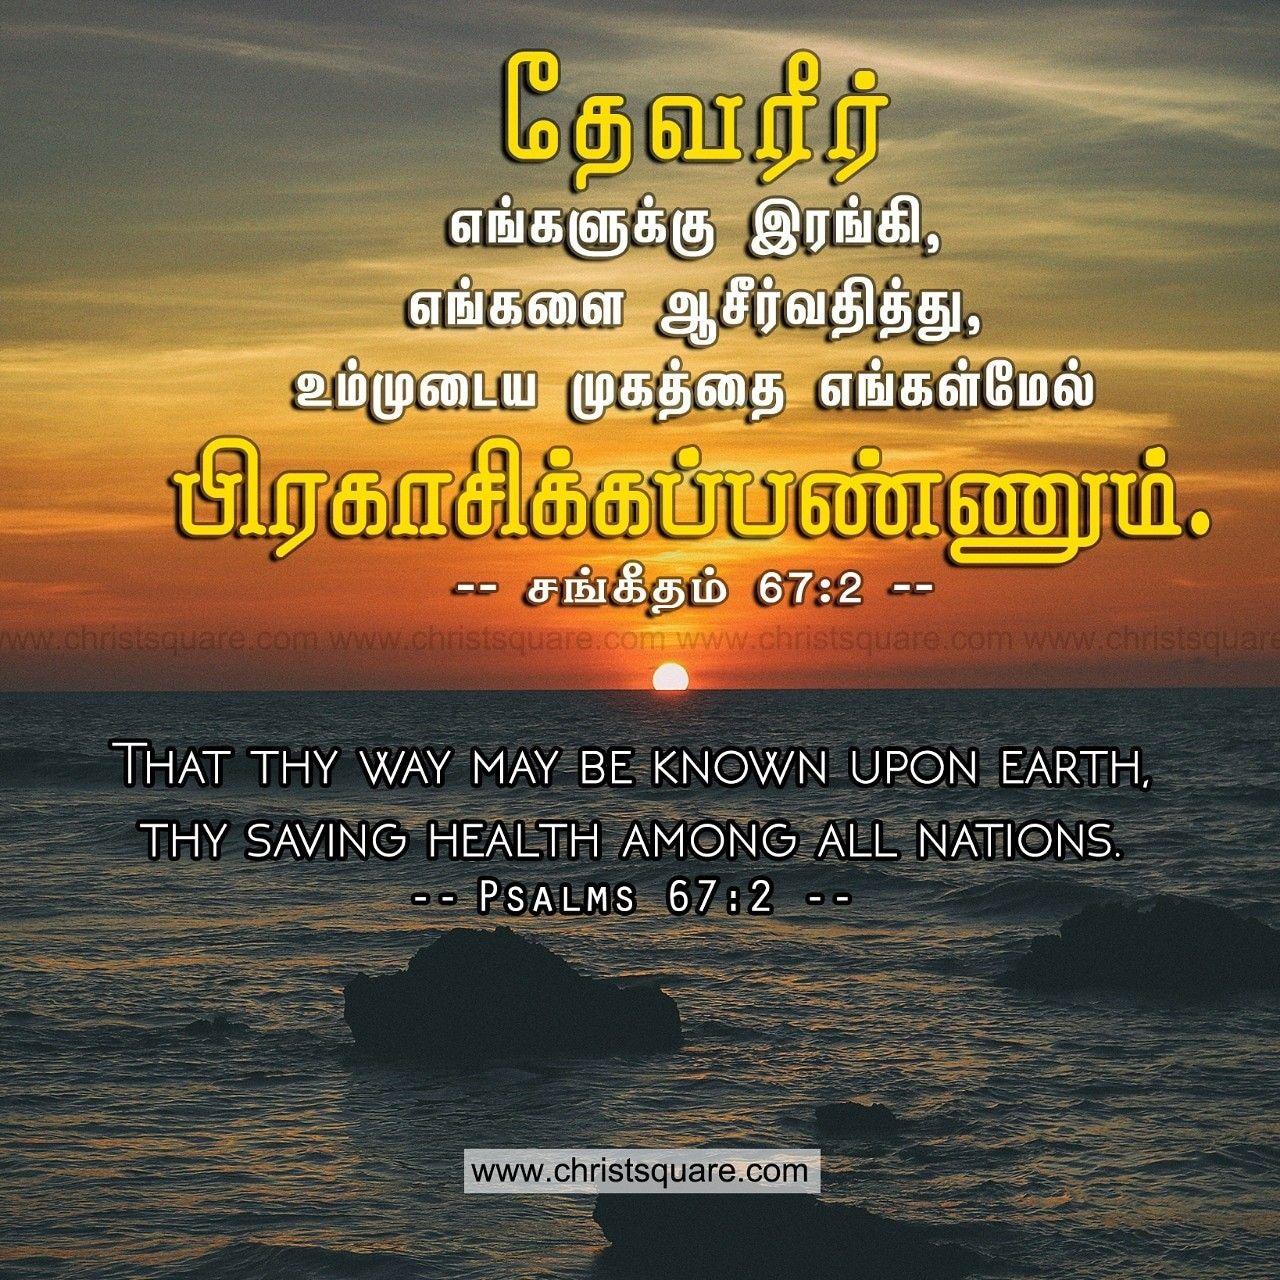 Tamil Christian Whatsapp Status Tamil Christian Whatsapp Dp Wallpaper Tamil Christian Wallpaper H Christian Verses Christian Wallpaper Hd Blessed Bible Verse